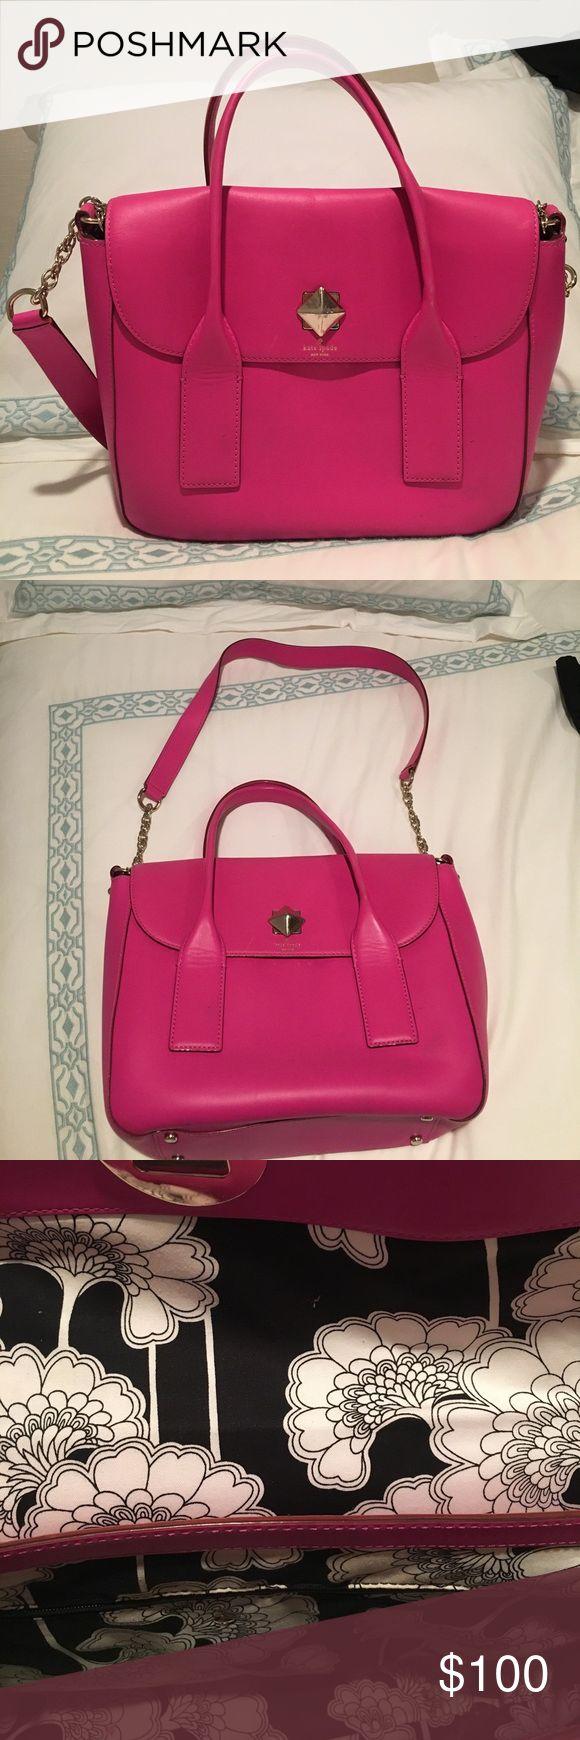 Kate Spade Pink bag Has handle and shoulder strap kate spade Bags